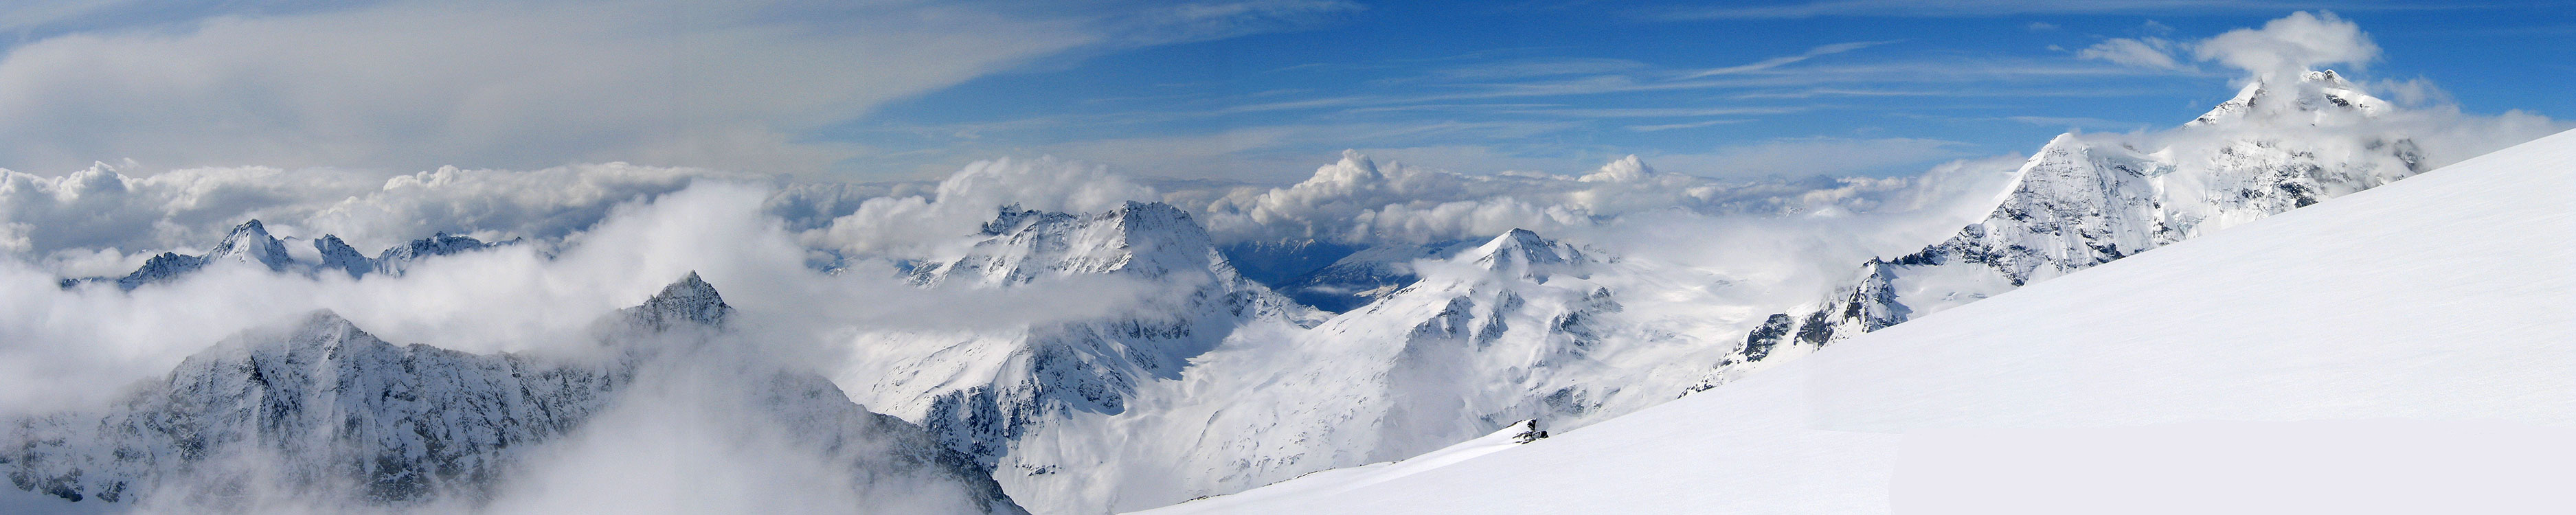 La Ruinette Walliser Alpen / Alpes valaisannes Schweiz panorama 29